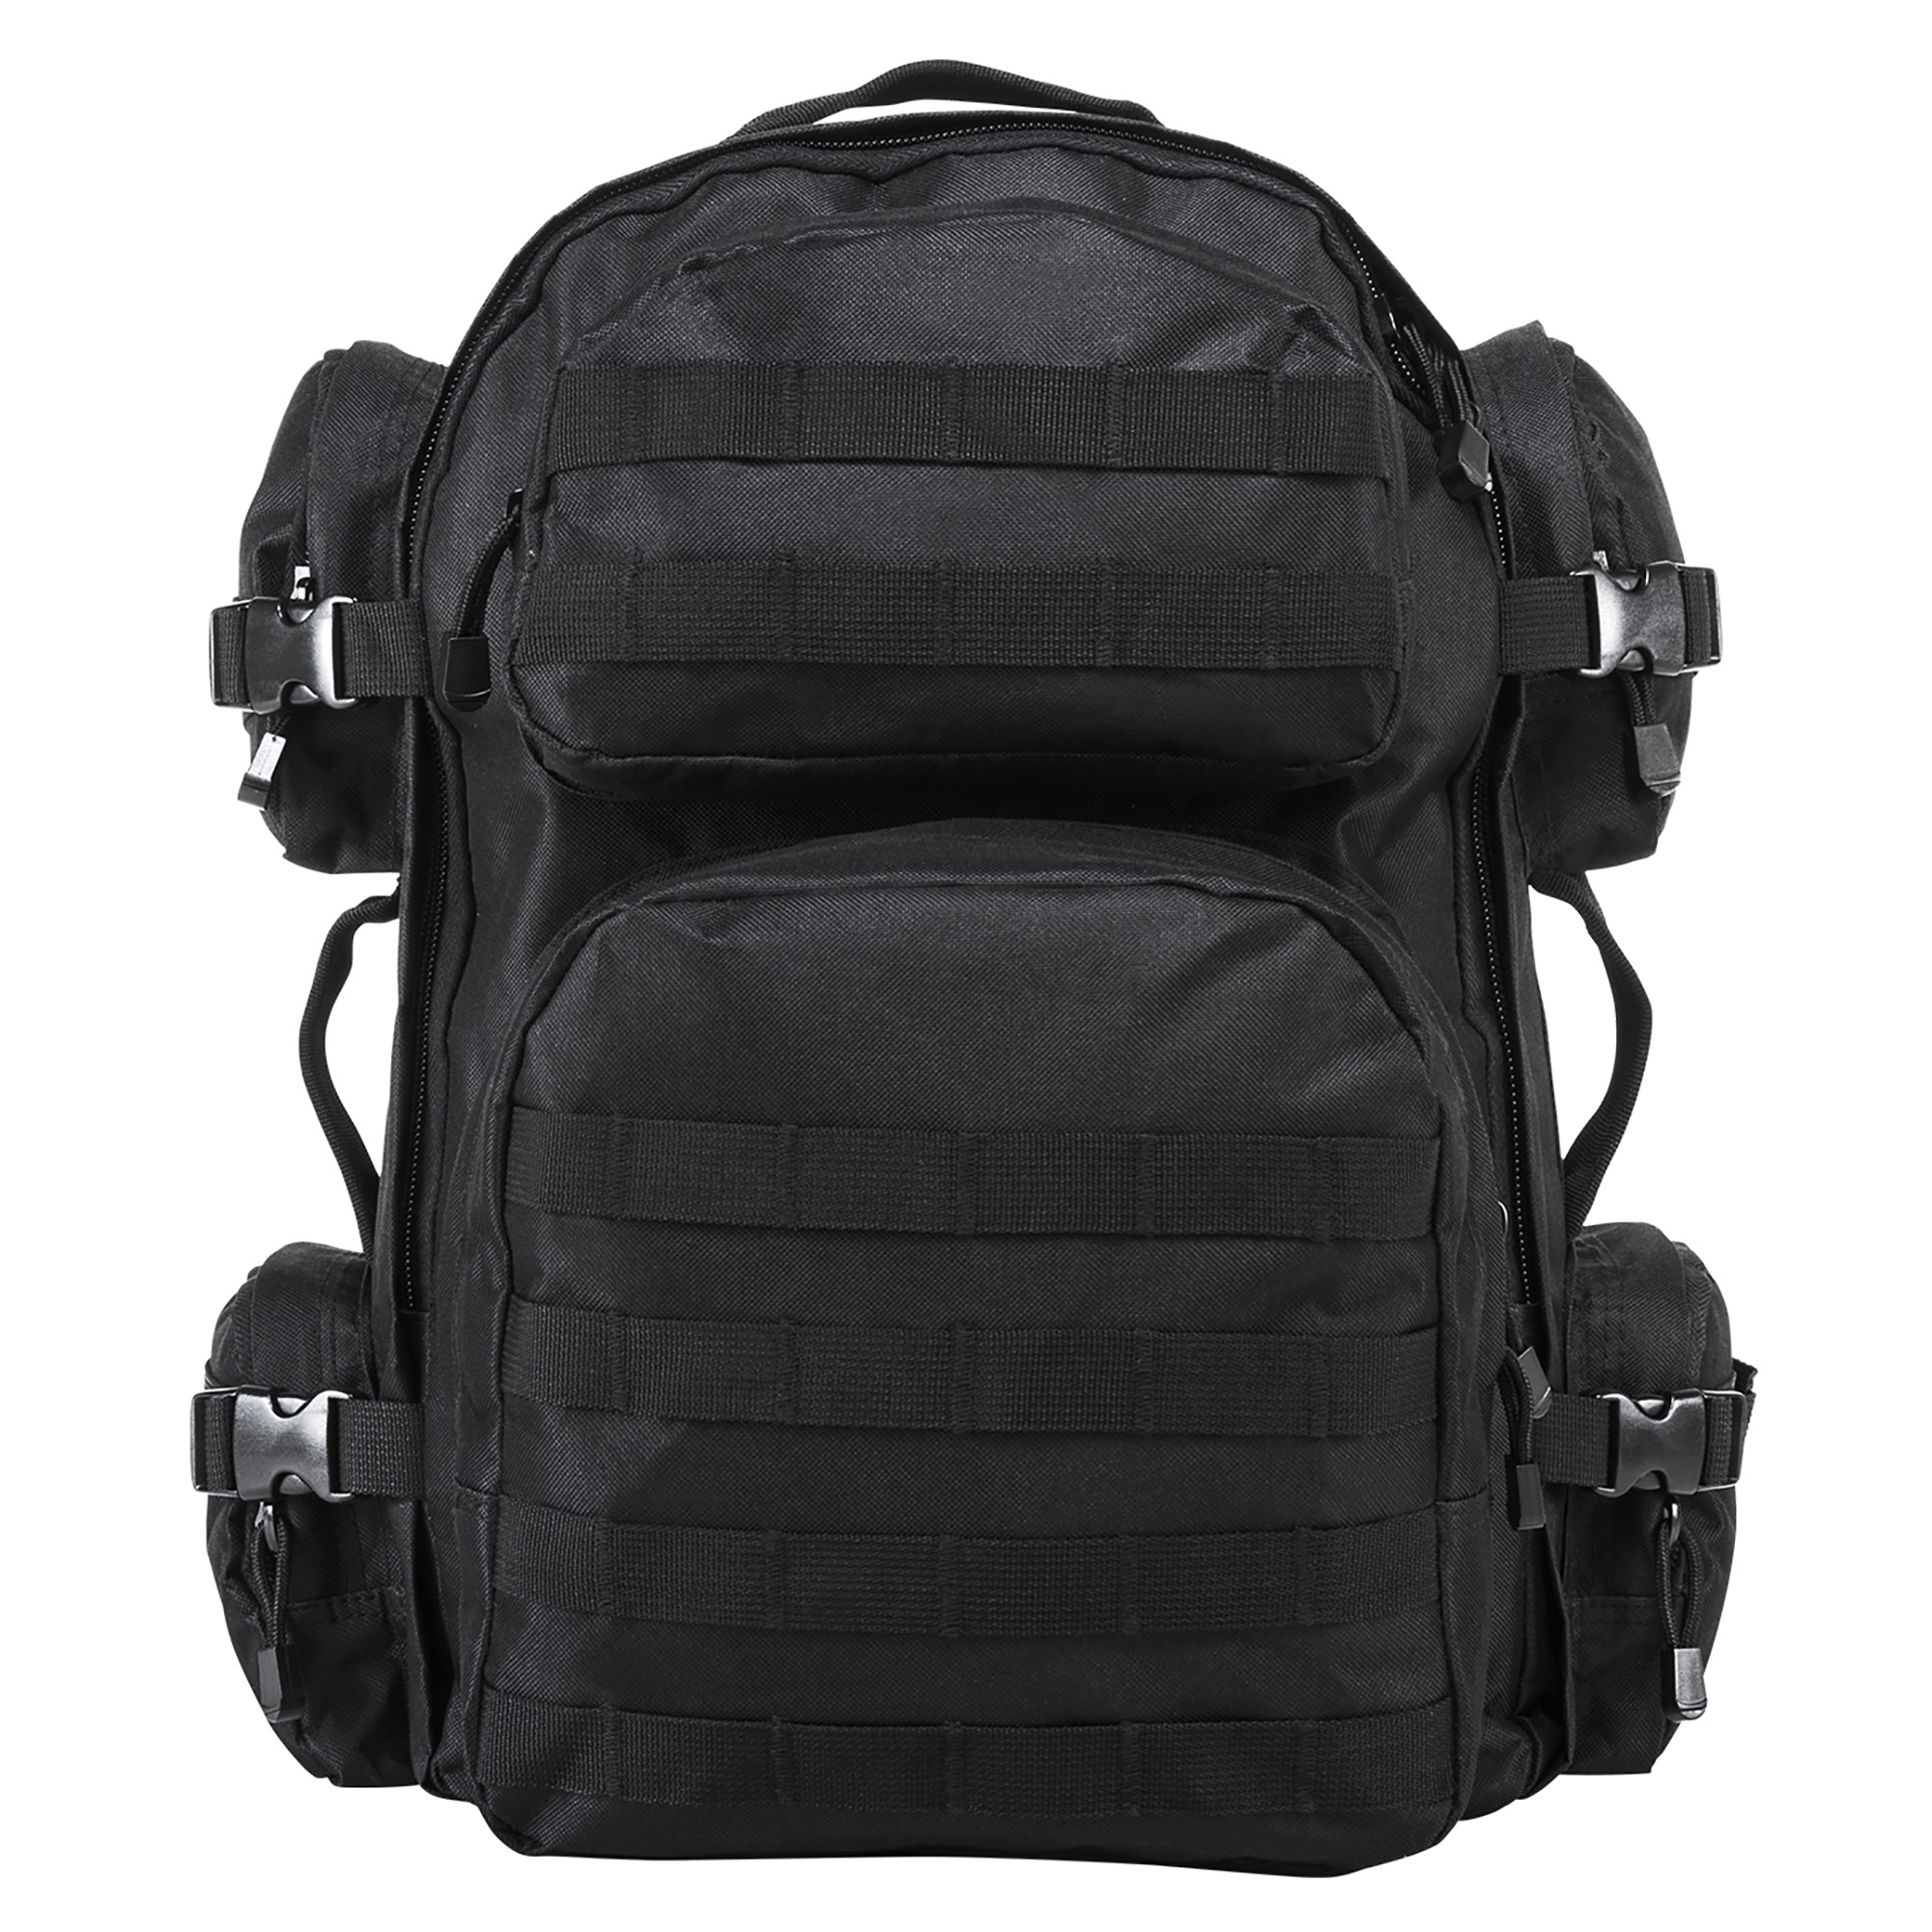 NCSTAR Tactical Backpack Nylon – Black